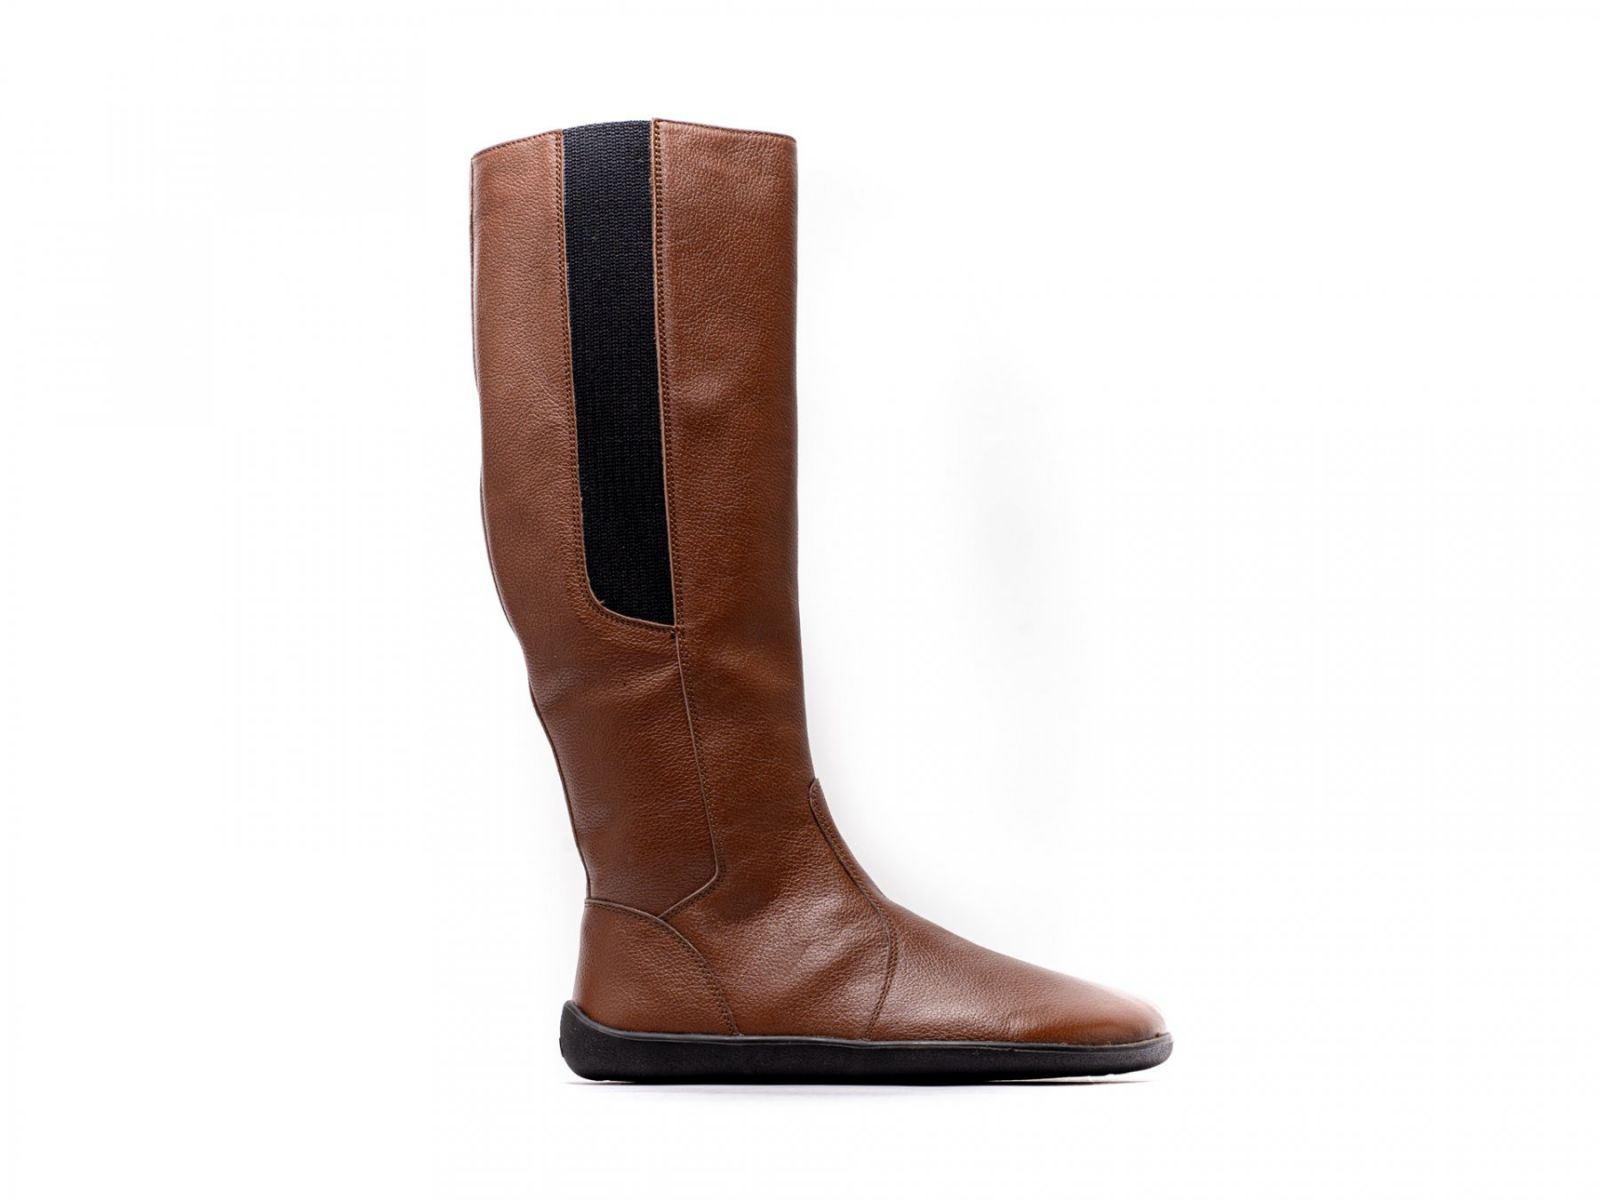 Barefoot Barefoot kozačky Be Lenka Sierra – Brown bosá